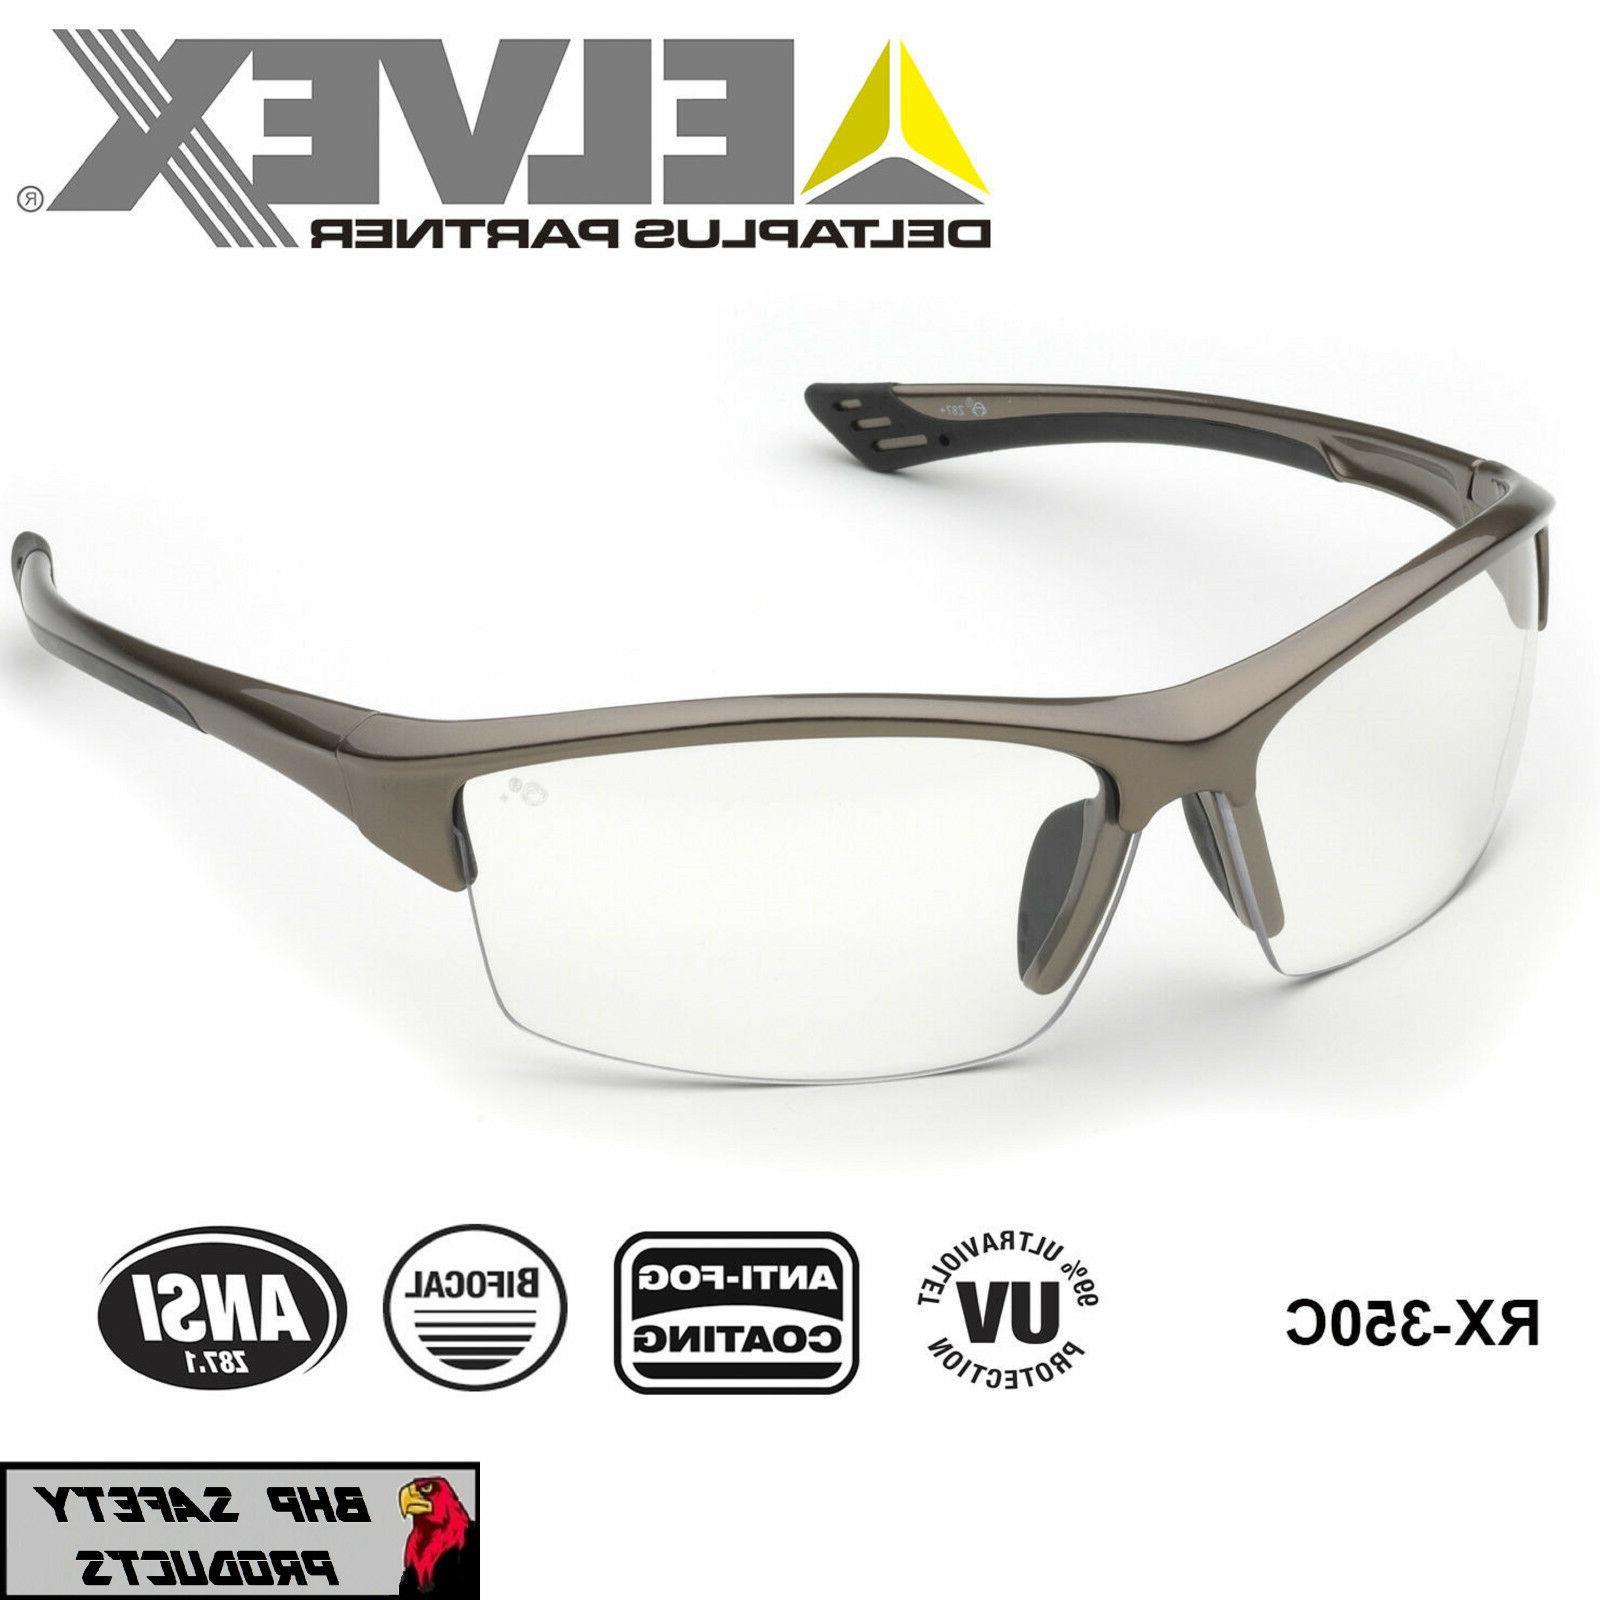 sonoma rx 350c bifocal reader safety glasses